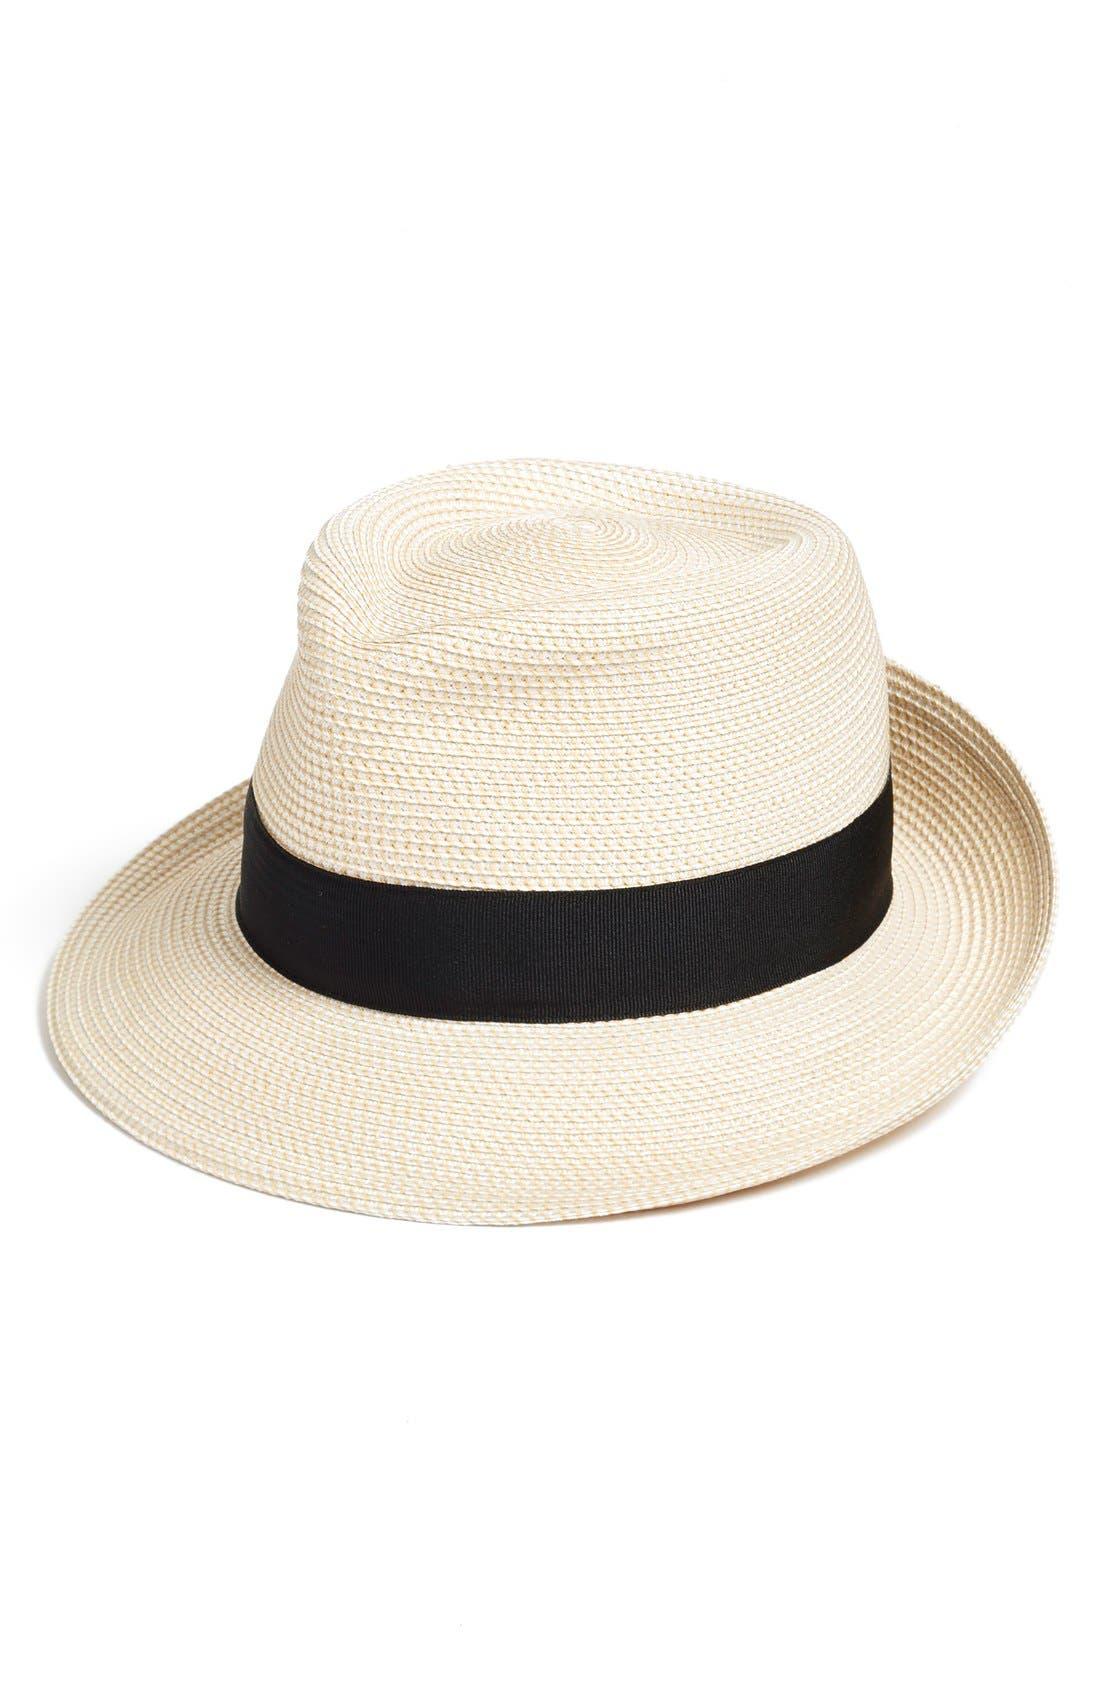 Classic Squishee Packable Fedora Sun Hat